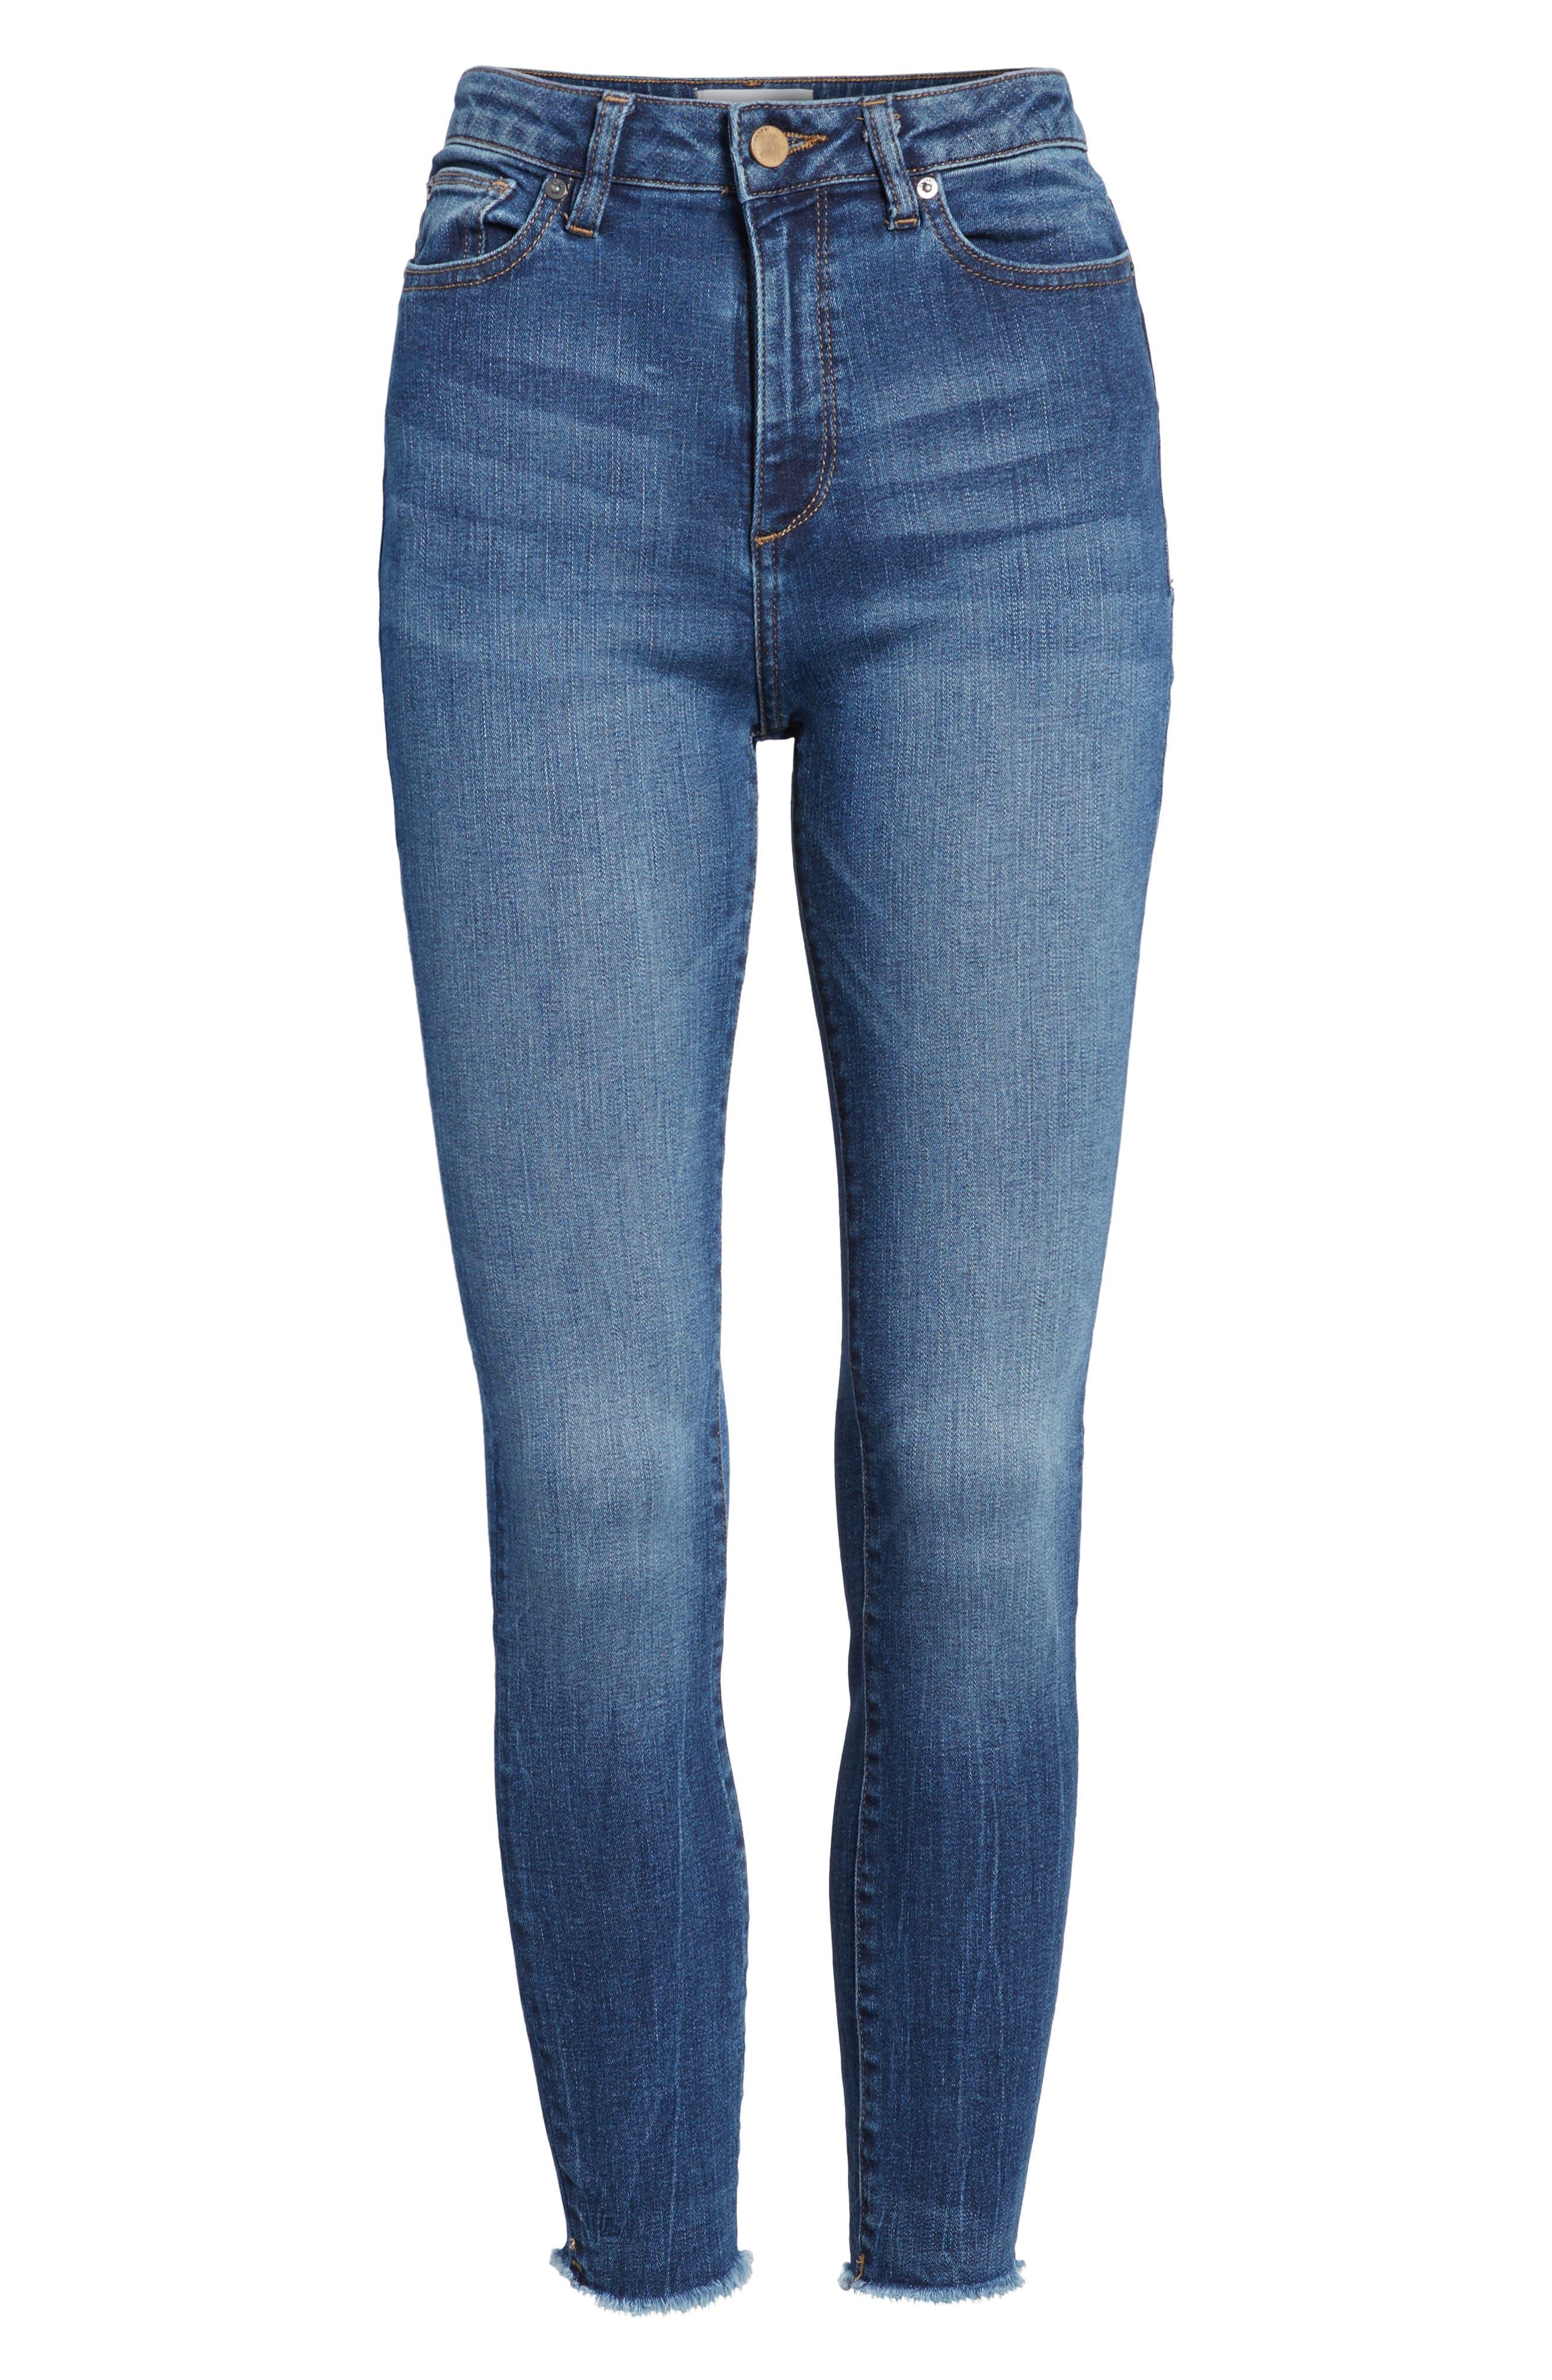 Chrissy Trimtone High Waist Skinny Jeans,                             Alternate thumbnail 6, color,                             425